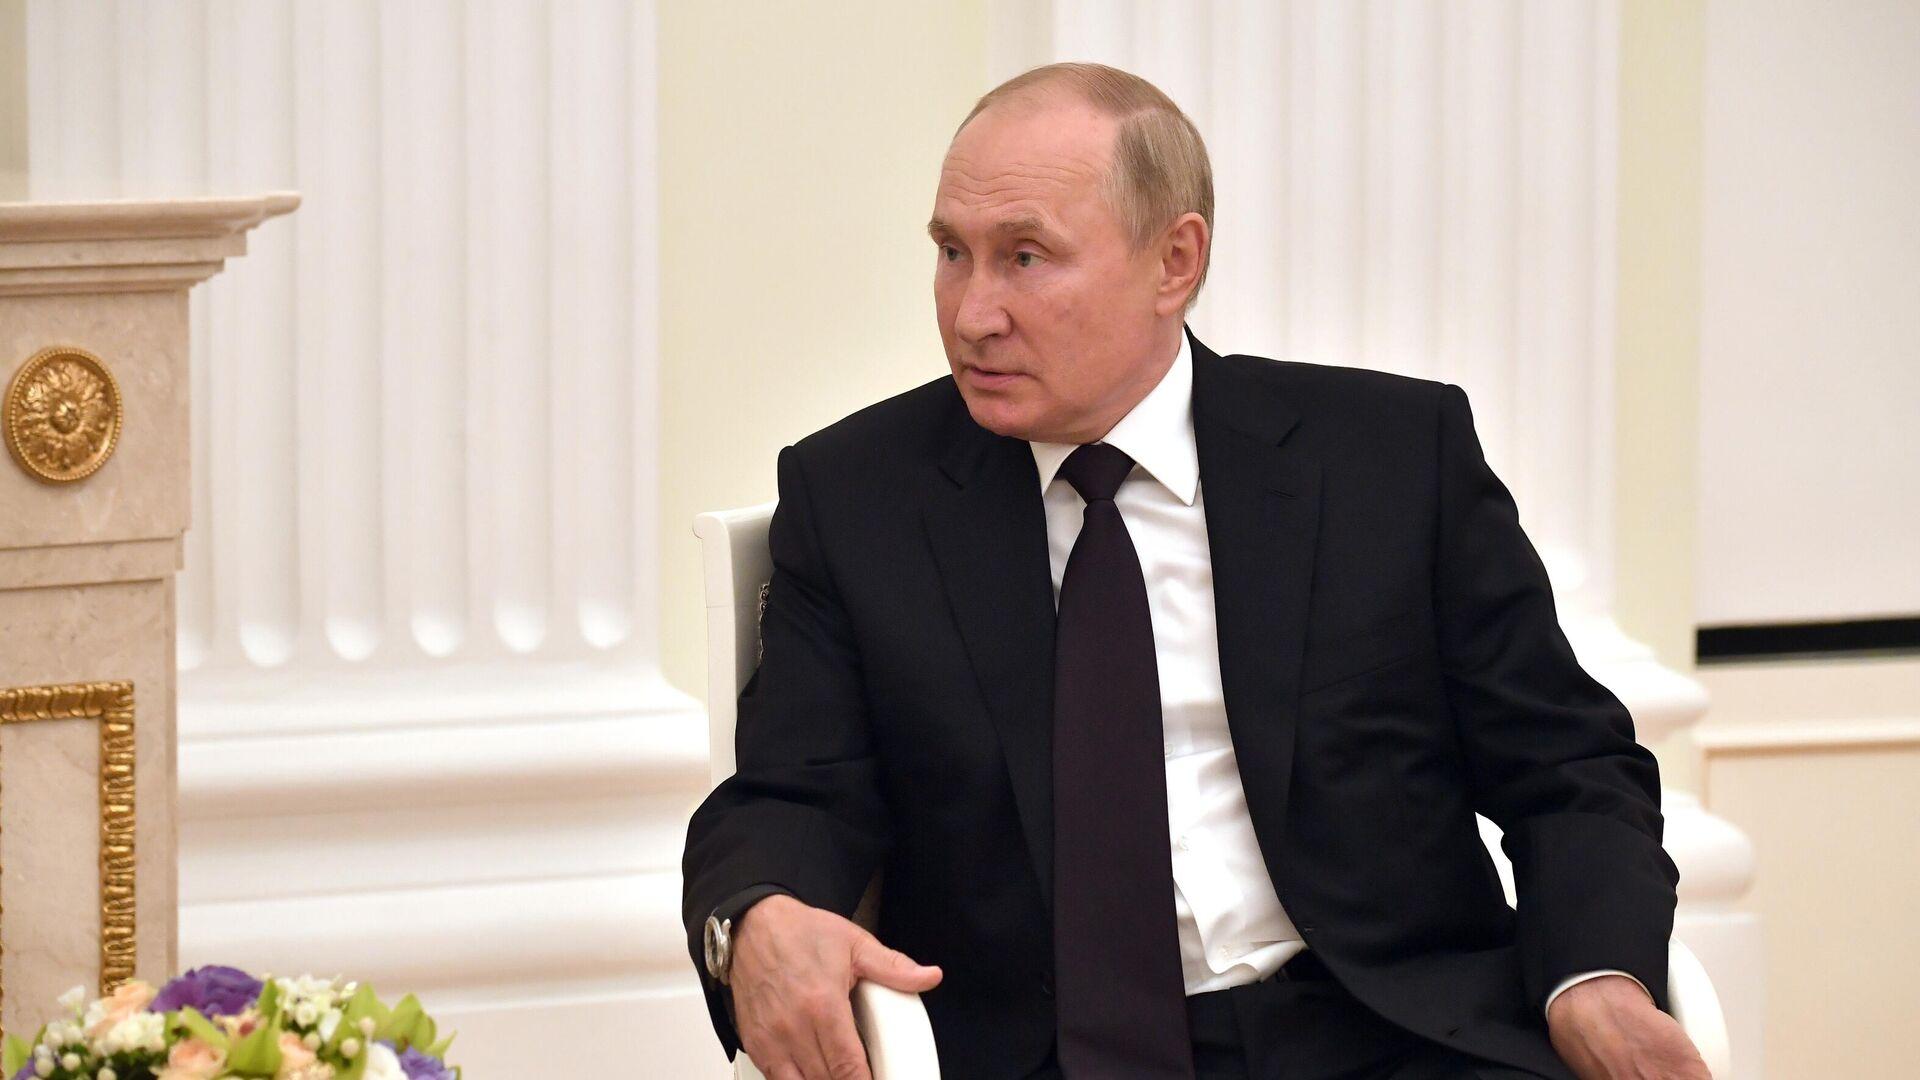 Президент РФ Владимир Путин во время встречи с президентом Белоруссии Александром Лукашенко - РИА Новости, 1920, 09.09.2021